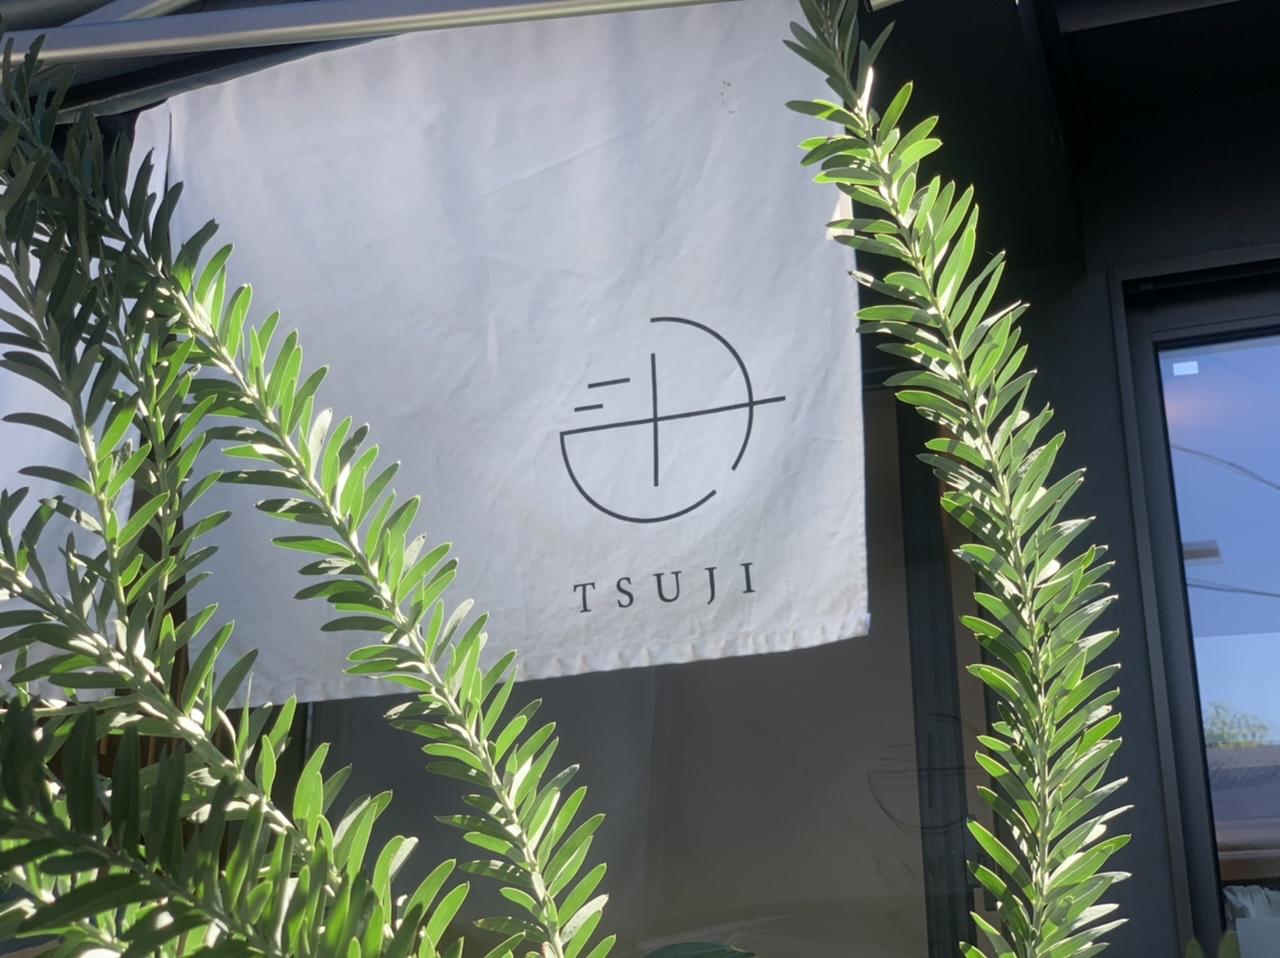 『TSUJI-お茶とかき氷-』の暖簾